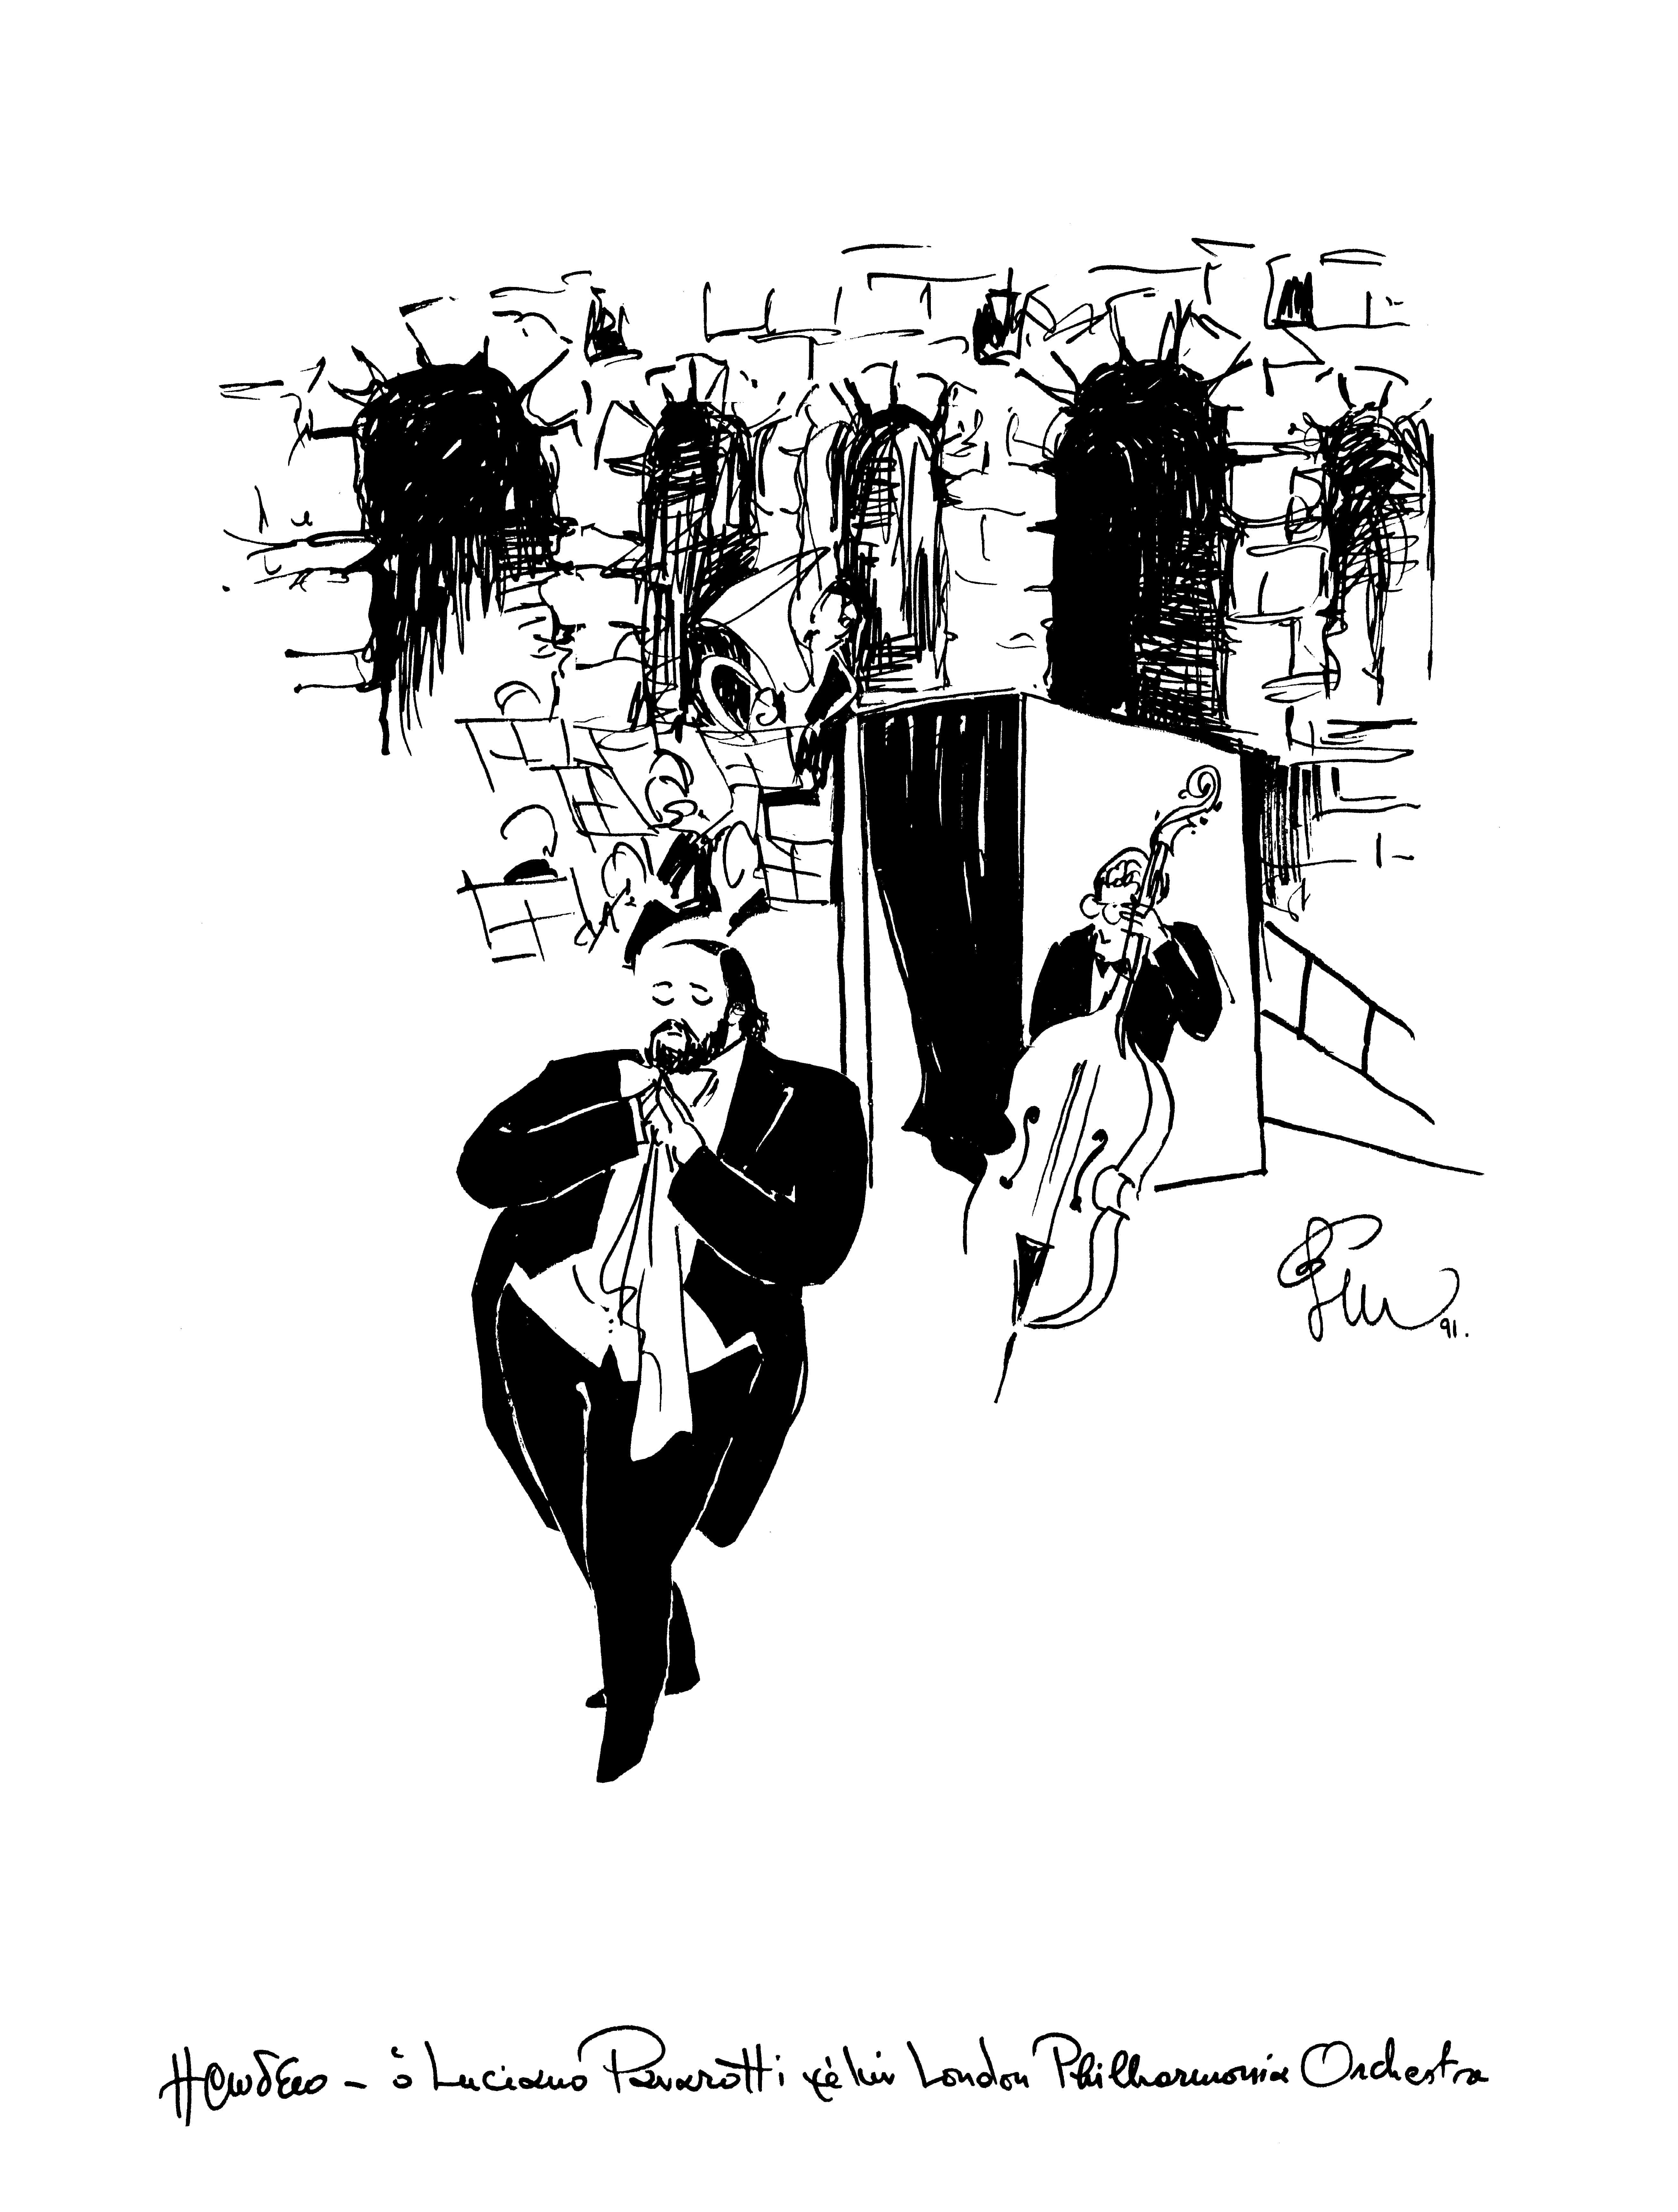 Luciano Pavarotti PHILARMONIA ORCHESTRA του Λονδινου Ηρωδειο 1991